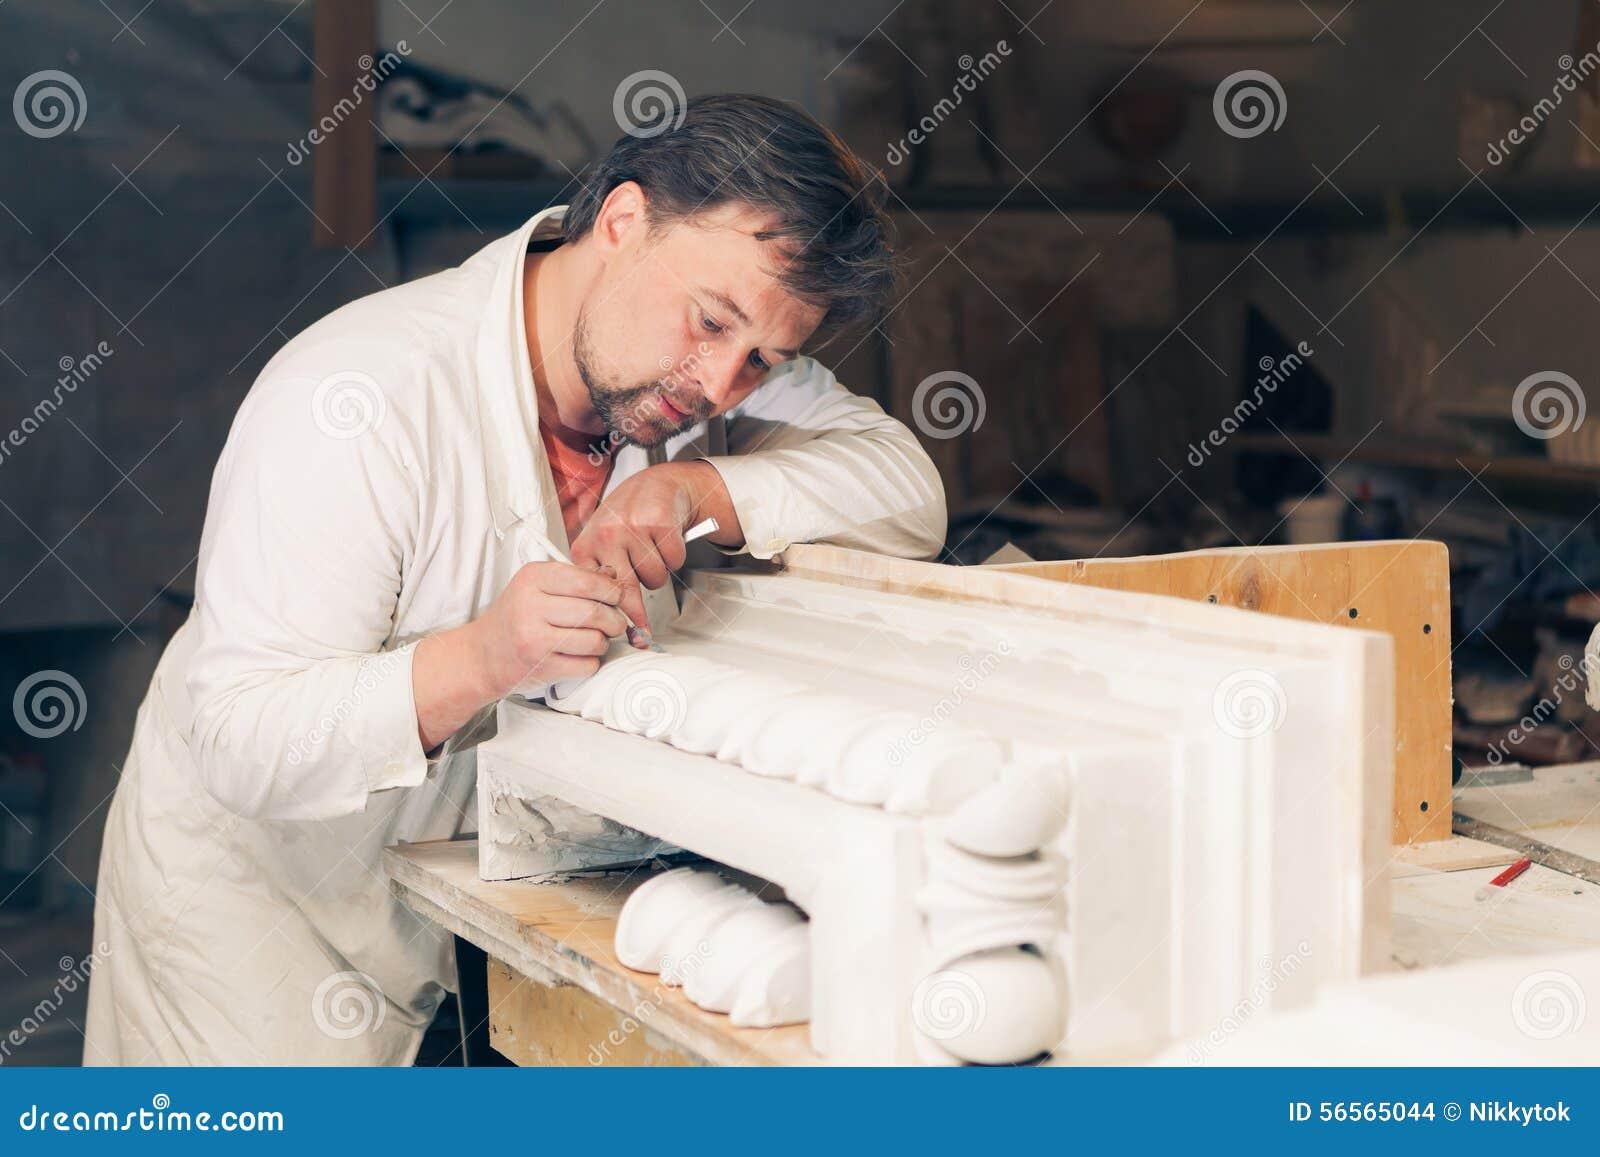 Download Αποκαταστάτης που κάνει την εργασία του Στοκ Εικόνες - εικόνα από γύψος, ανθρώπινος: 56565044